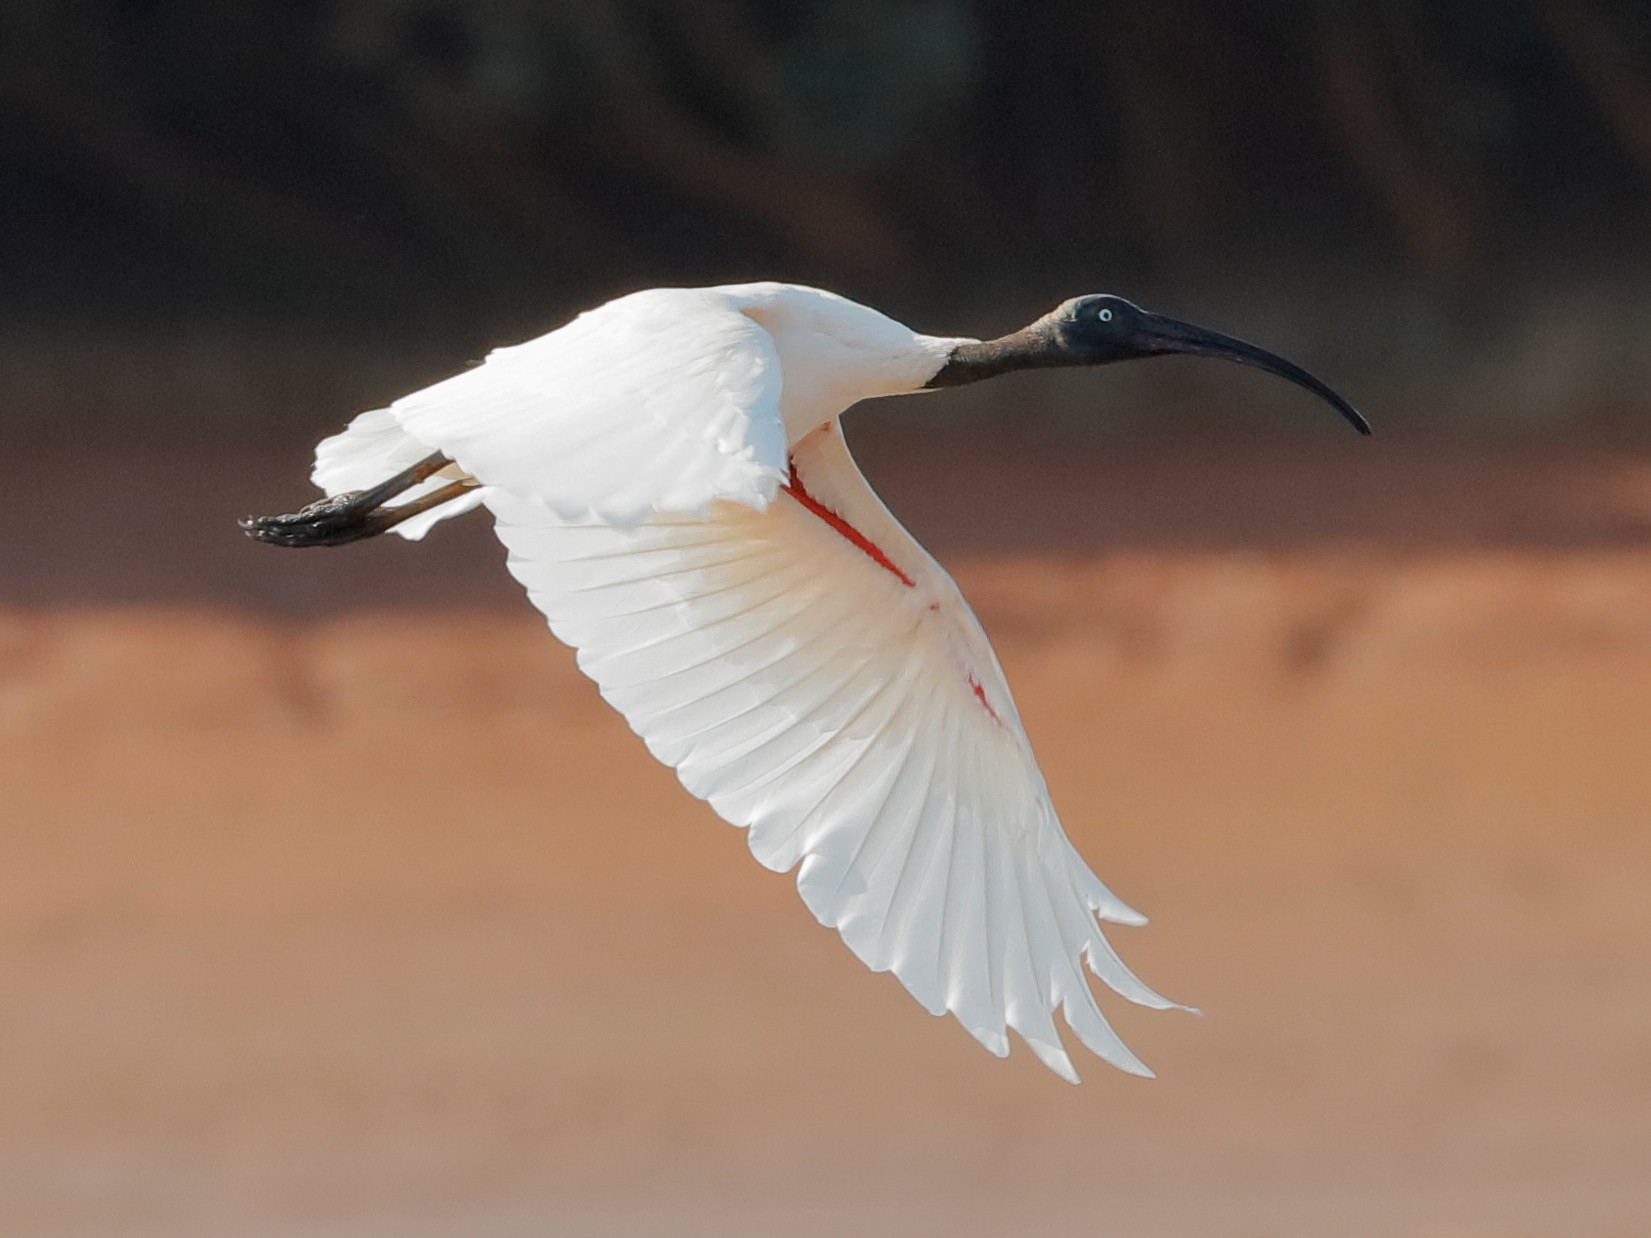 Madagascar Sacred Ibis - Holger Teichmann